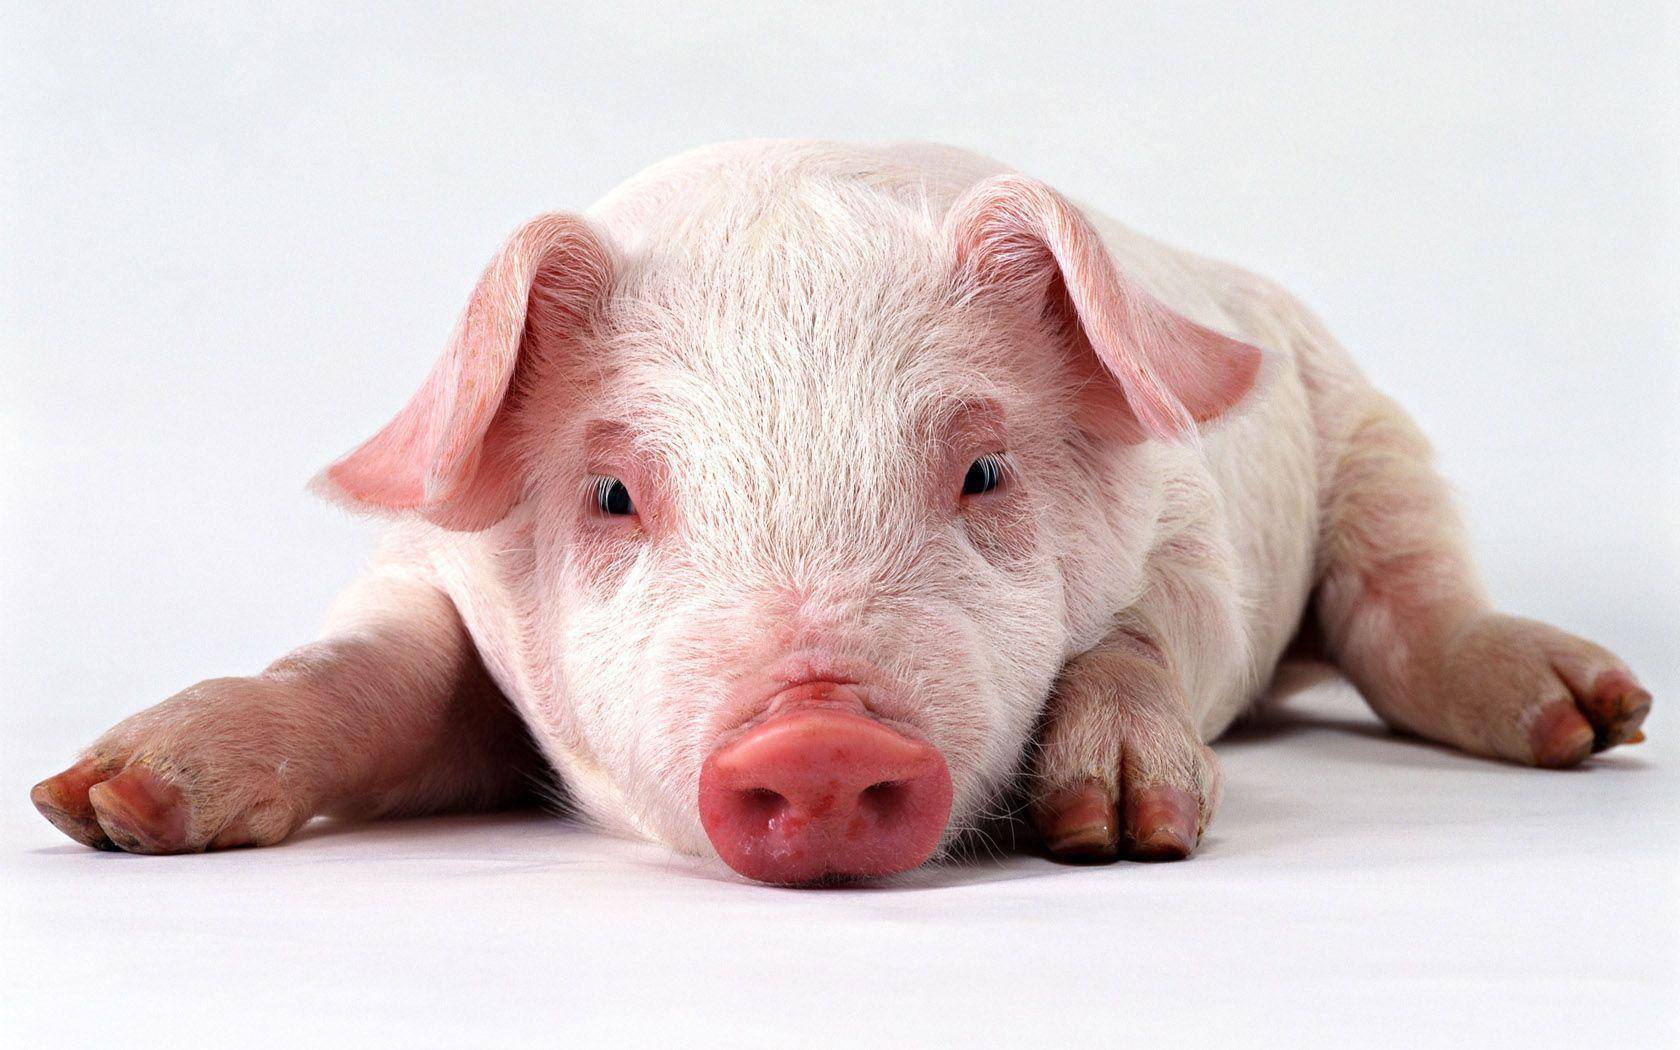 Cute Pig Wallpapers 1680x1050